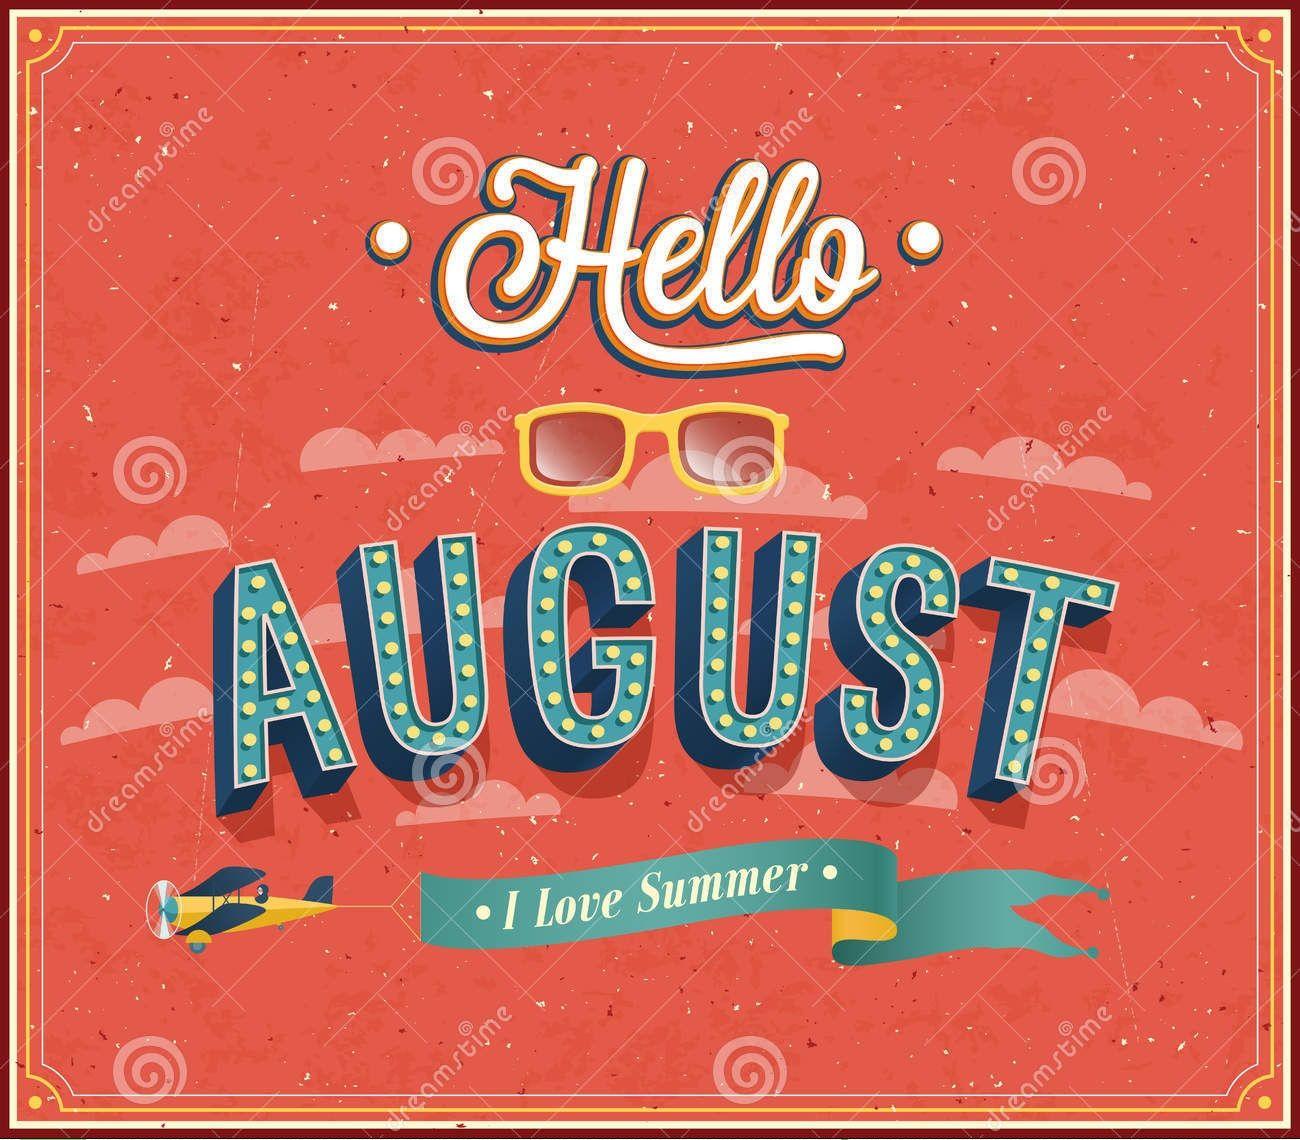 august - photo #34